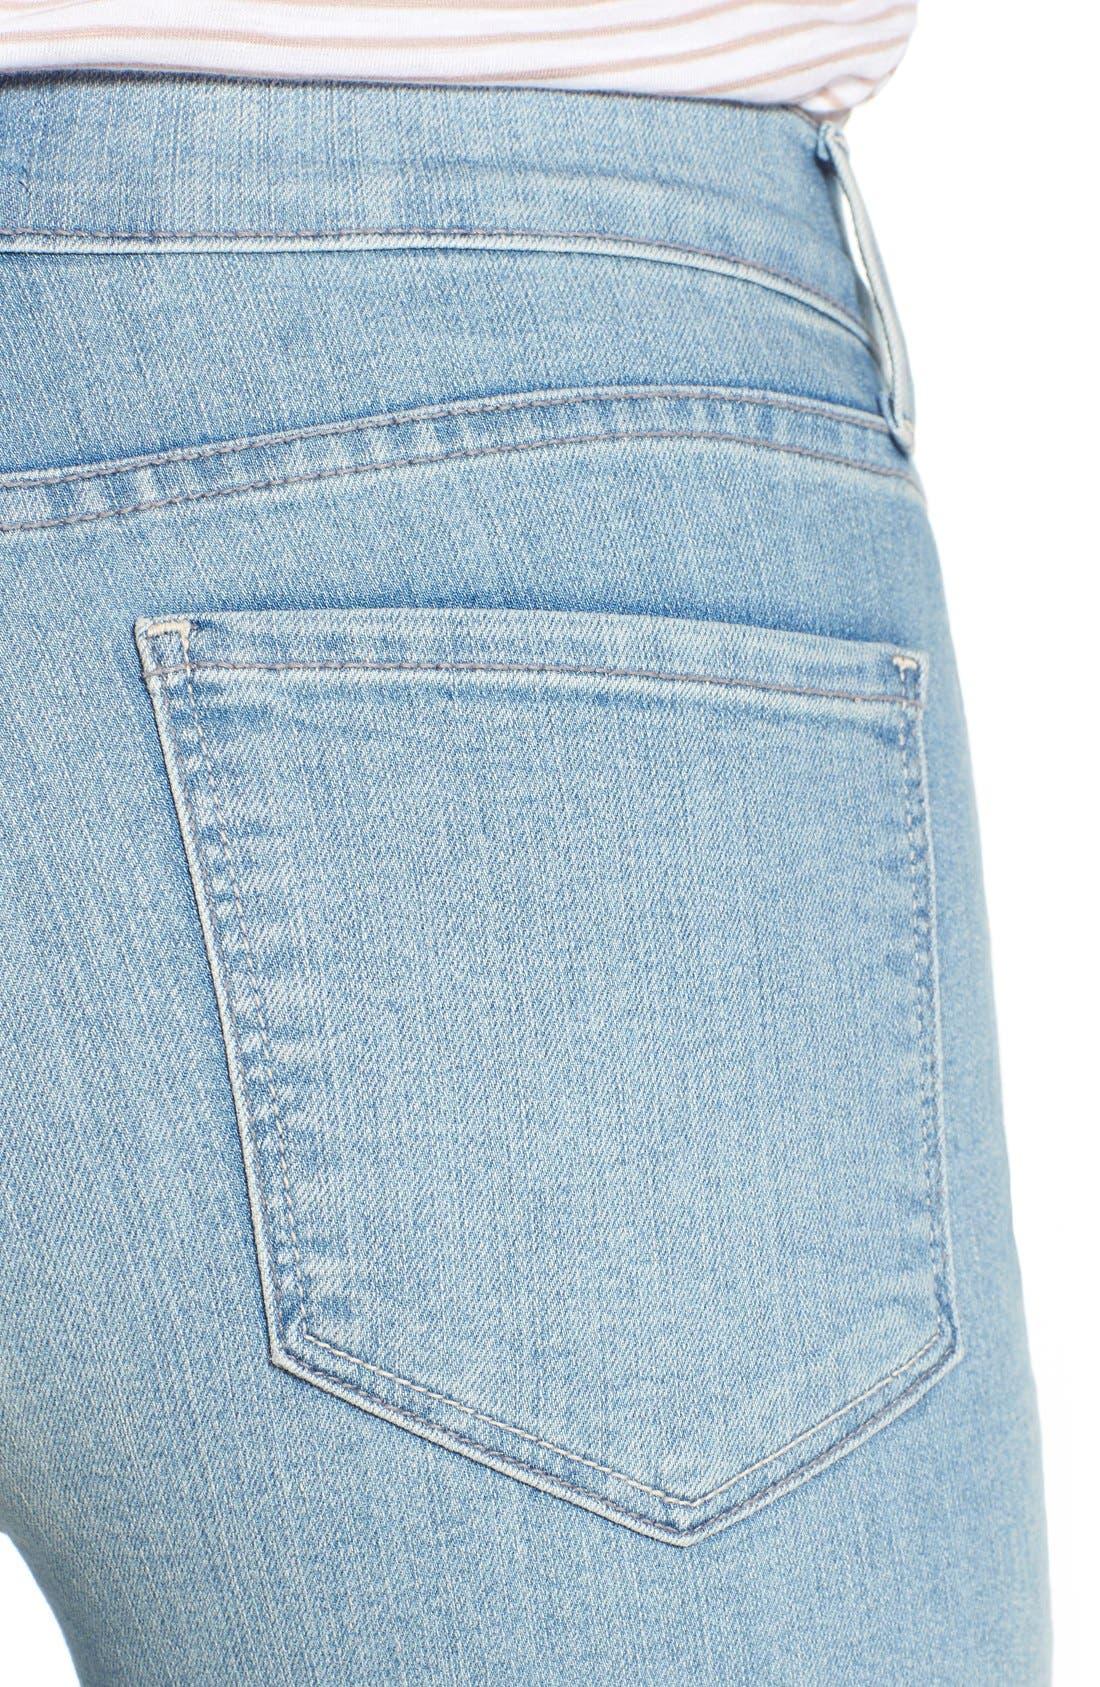 'Dayla' Colored Wide Cuff Capri Jeans,                             Alternate thumbnail 54, color,